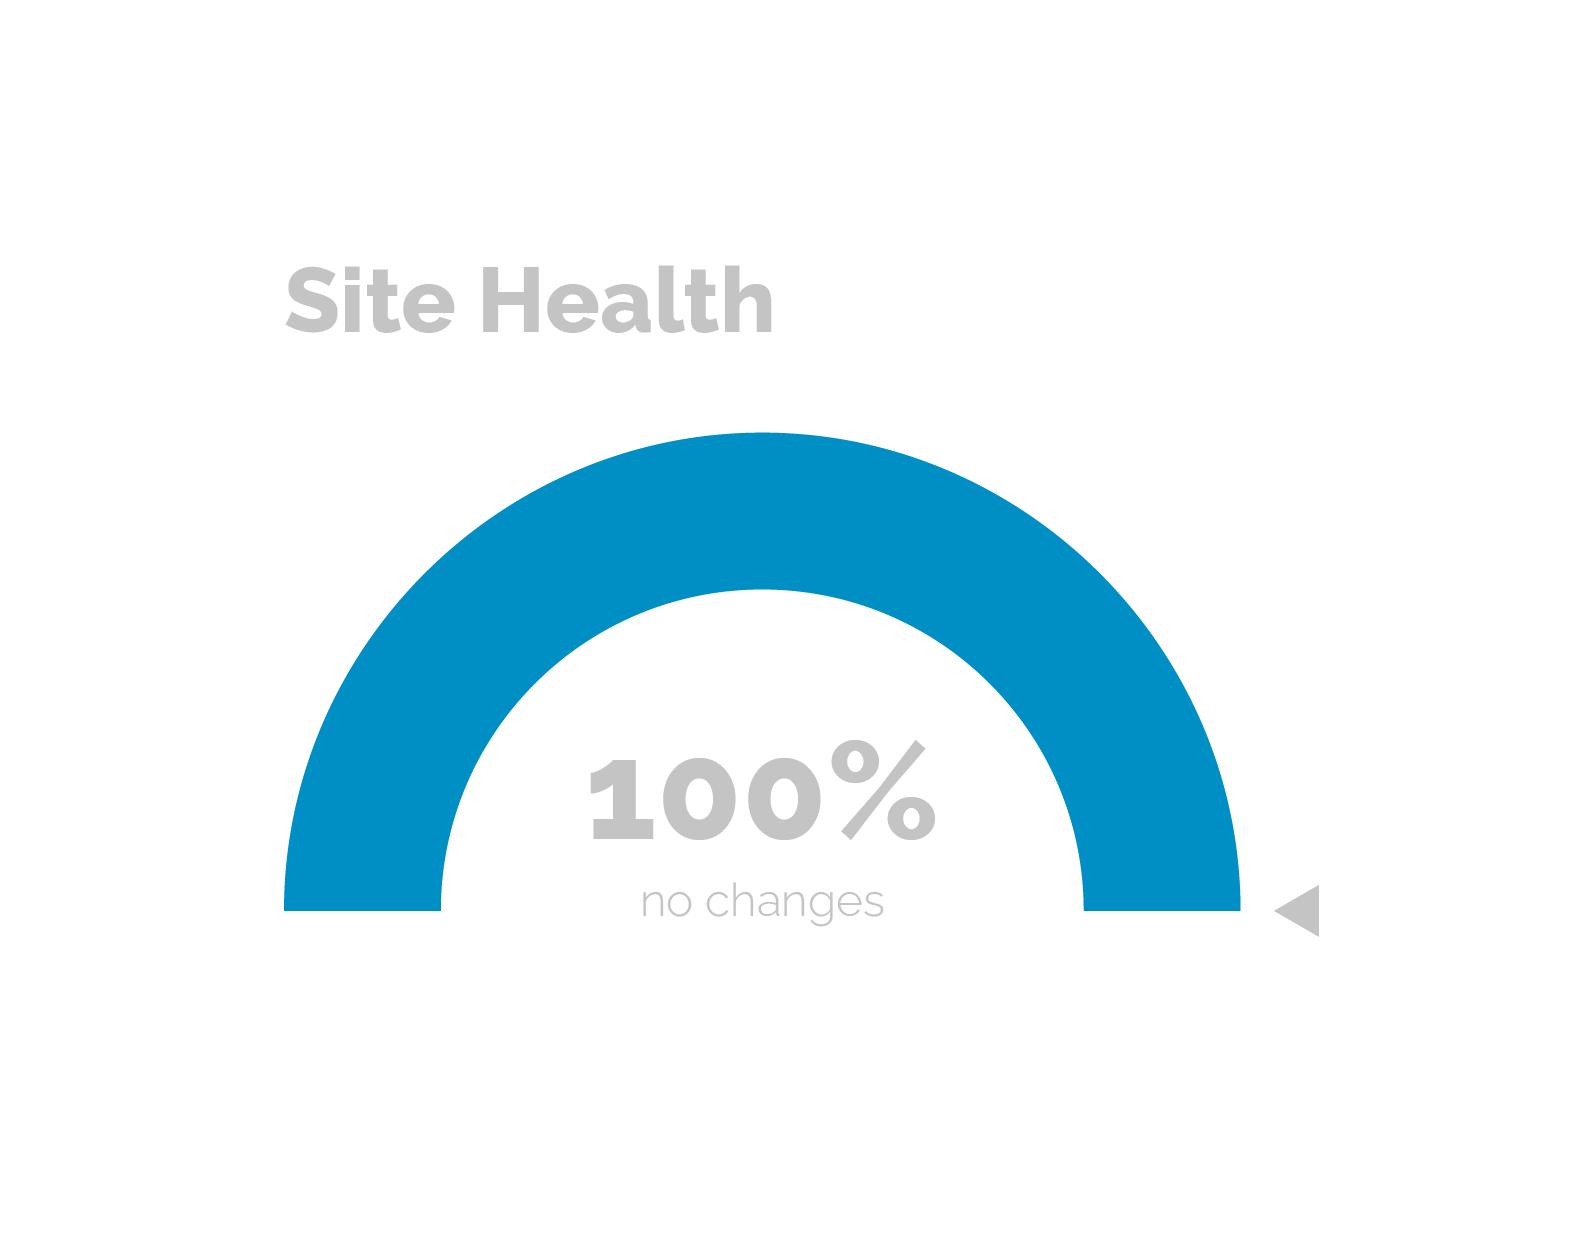 site health